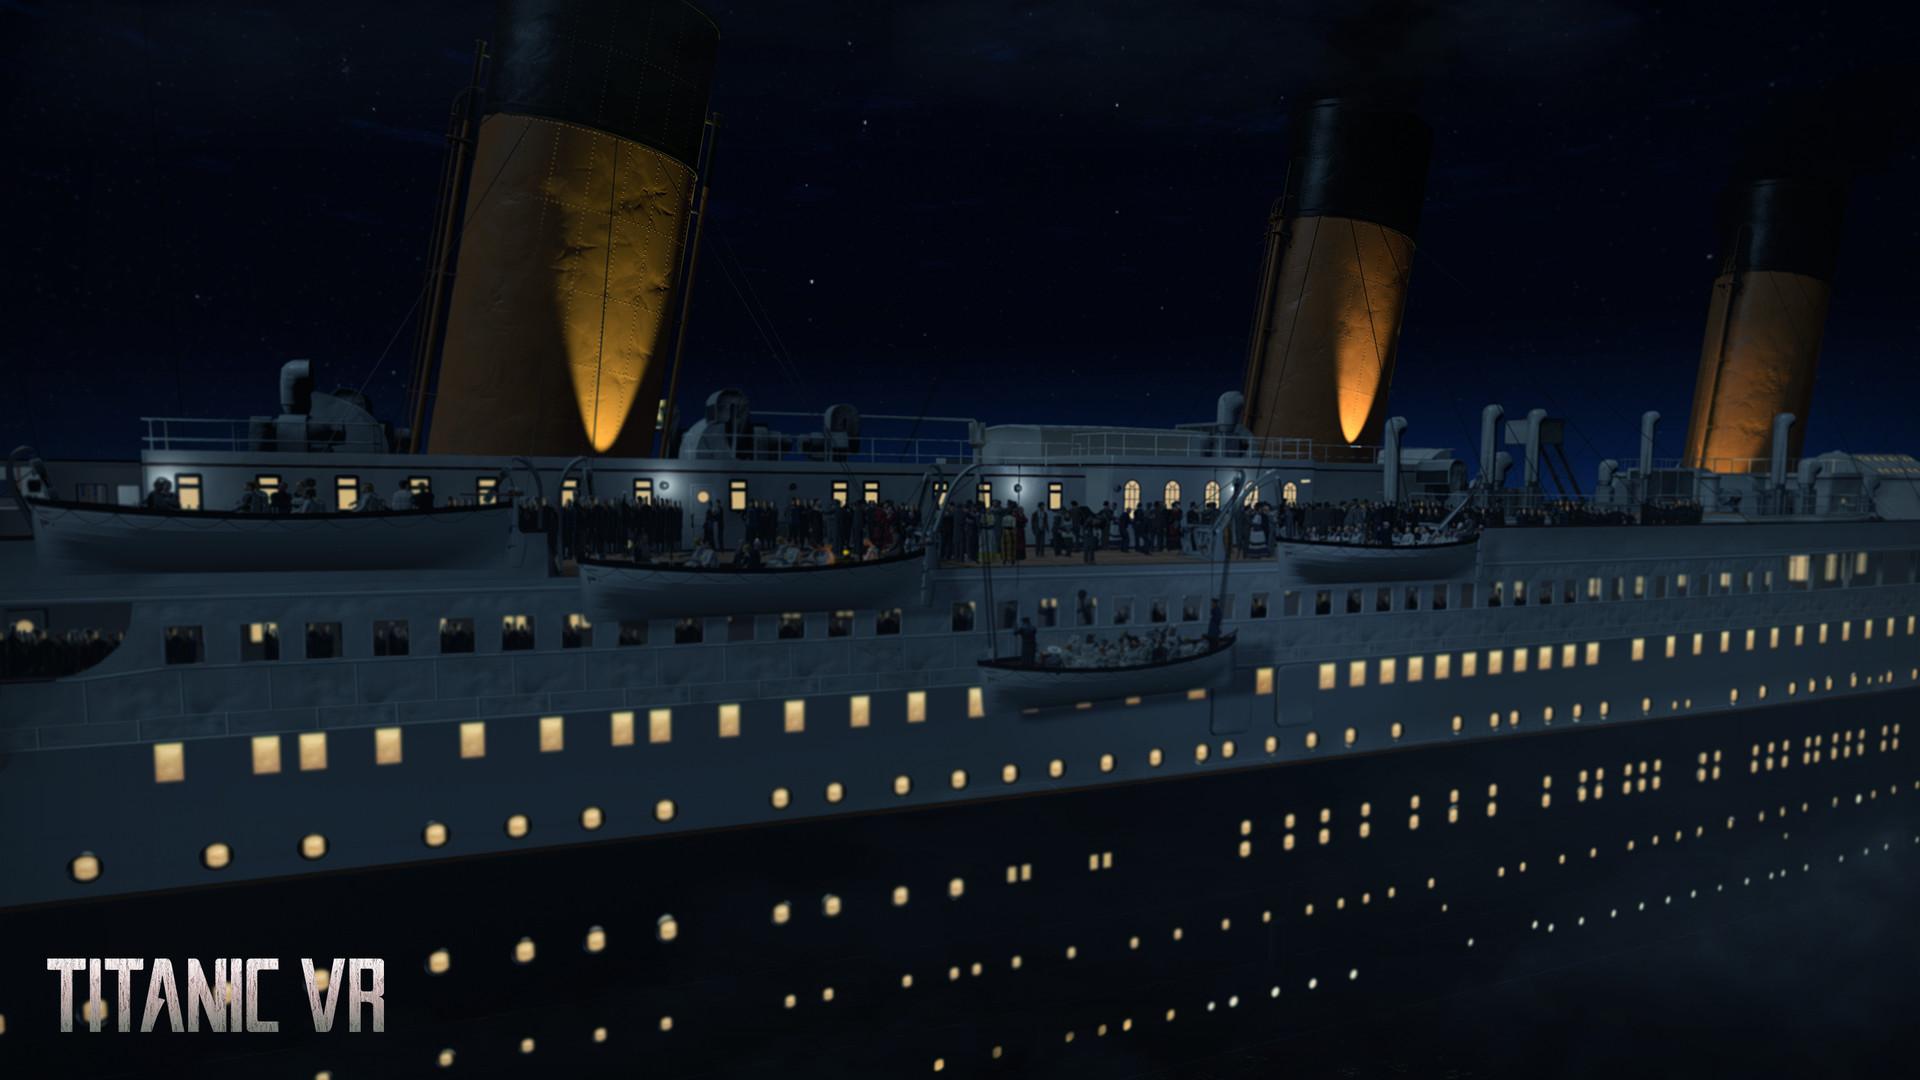 Titanic VR Ss_75ad101d0e0b3c30c59830df6fc32f9d4e615209.1920x1080